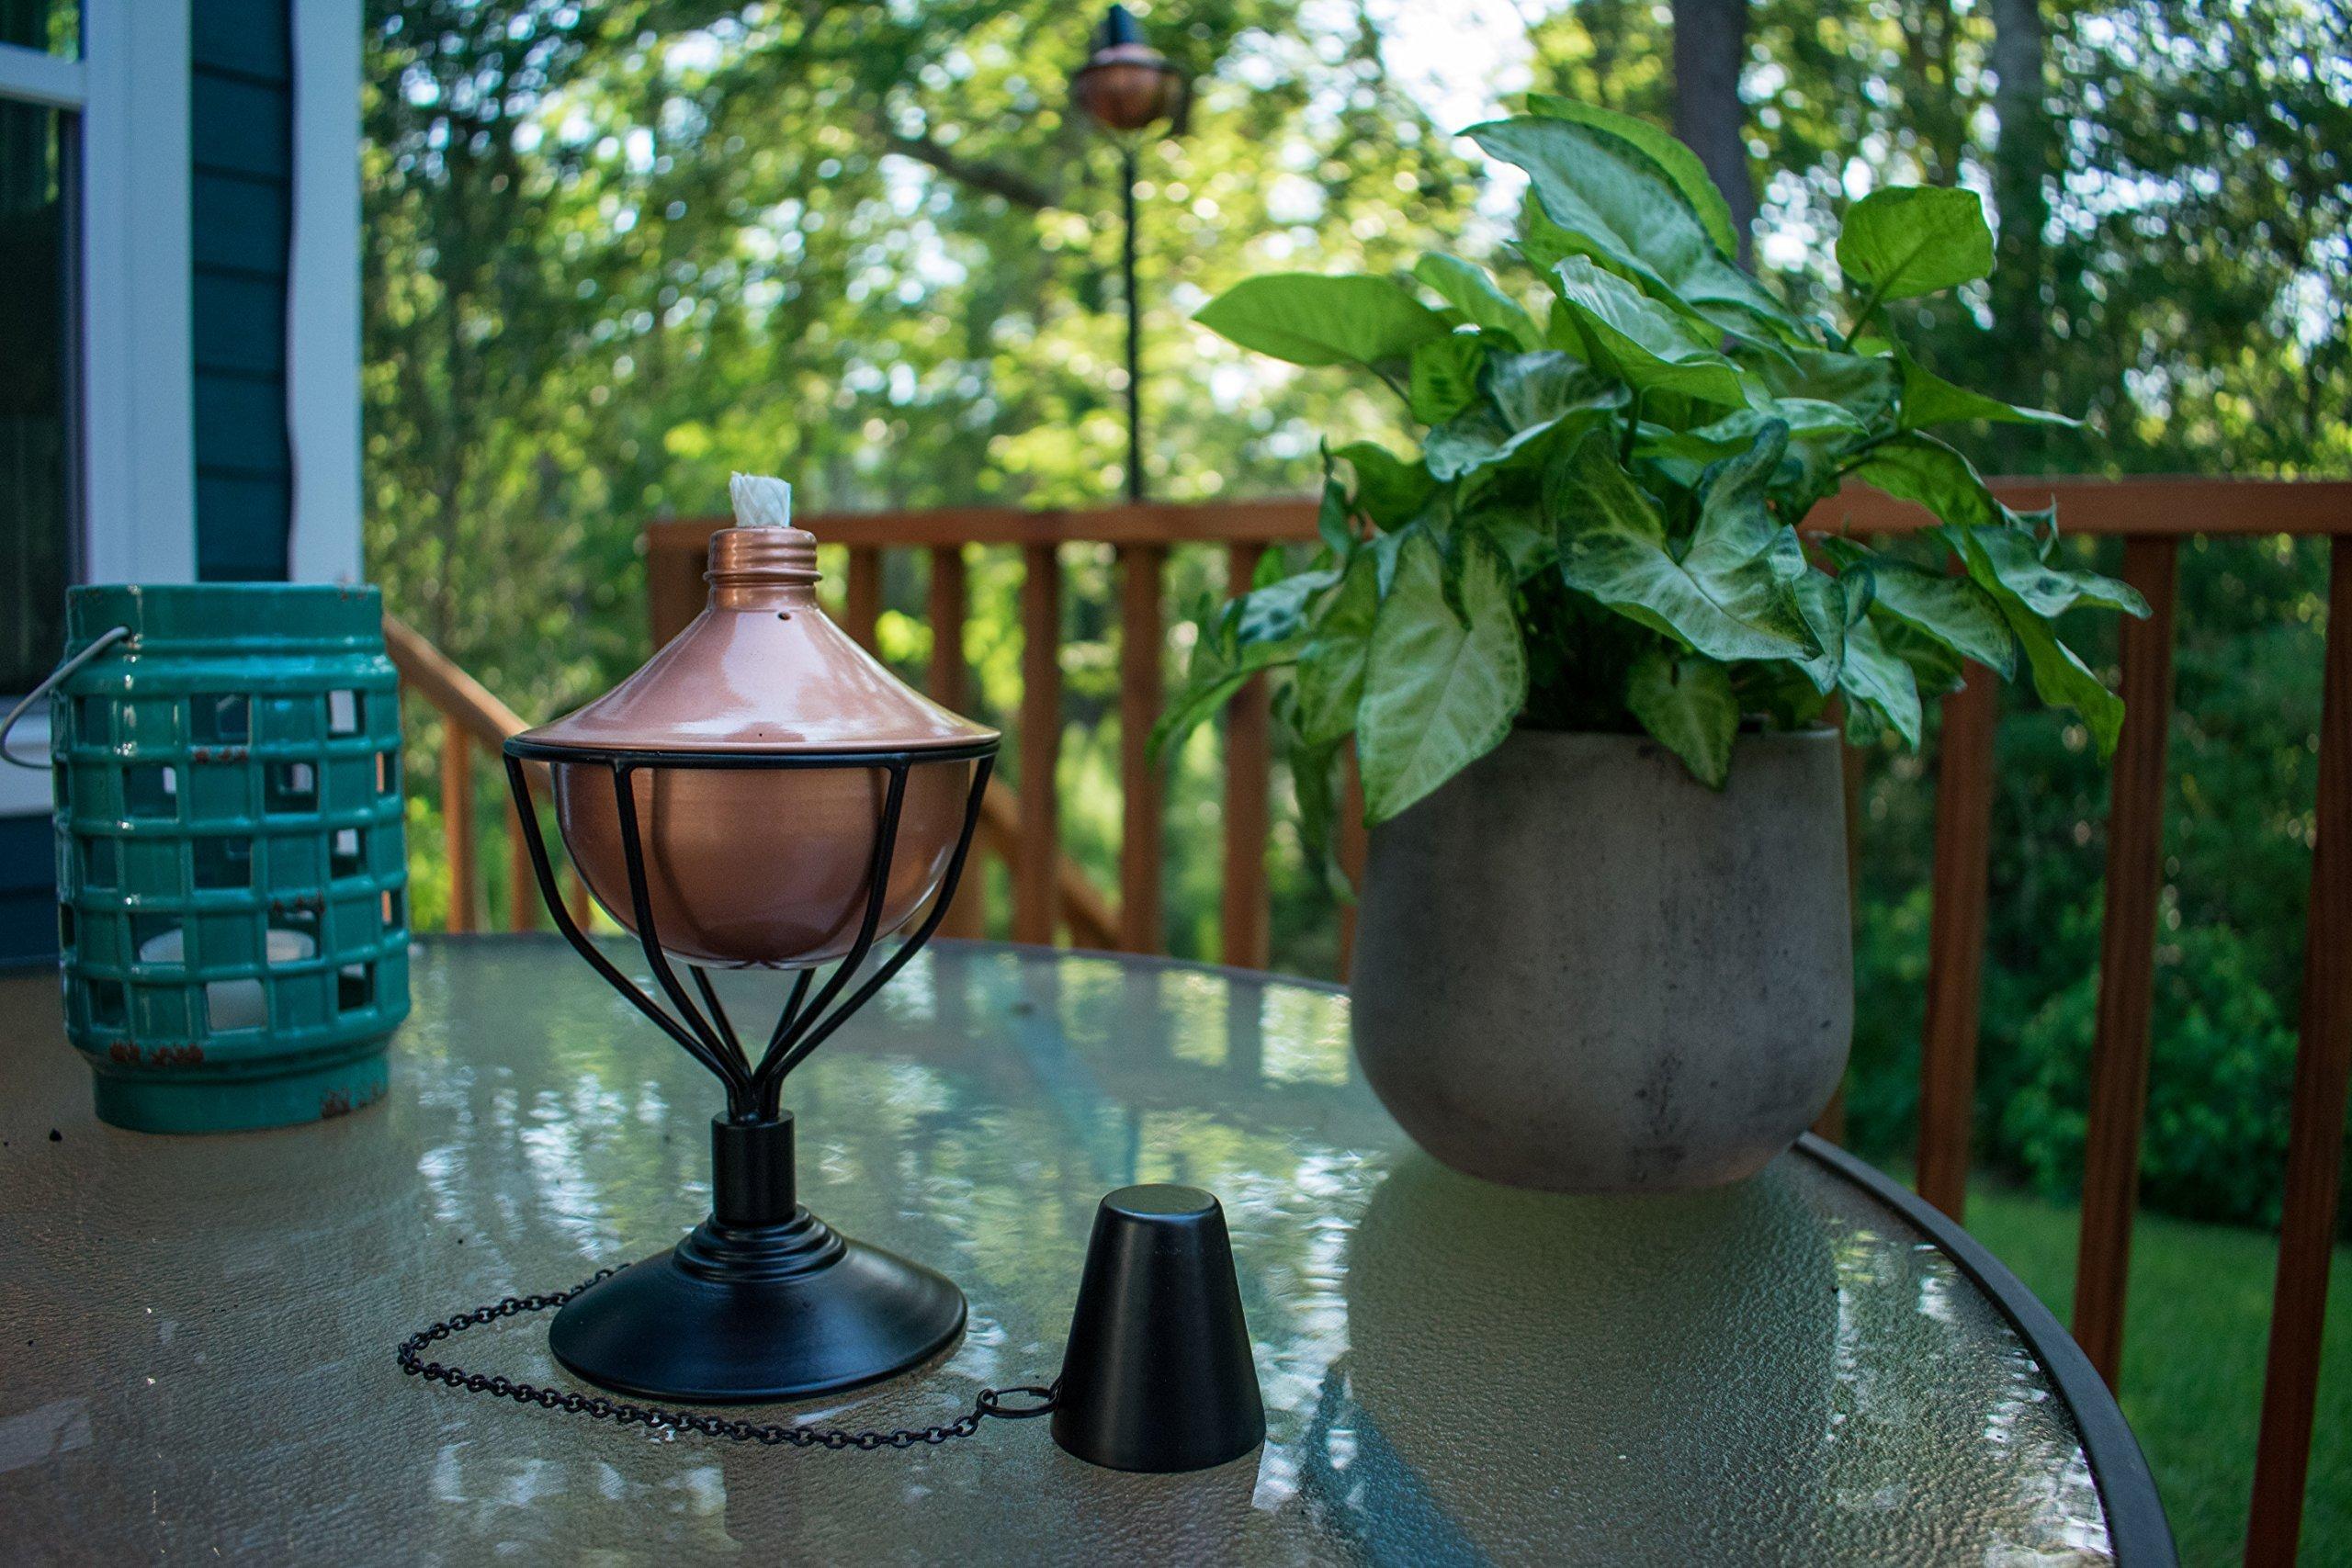 Dusq All-In-One Citronella Garden Torch Modern Copper Finish by Dusq (Image #5)